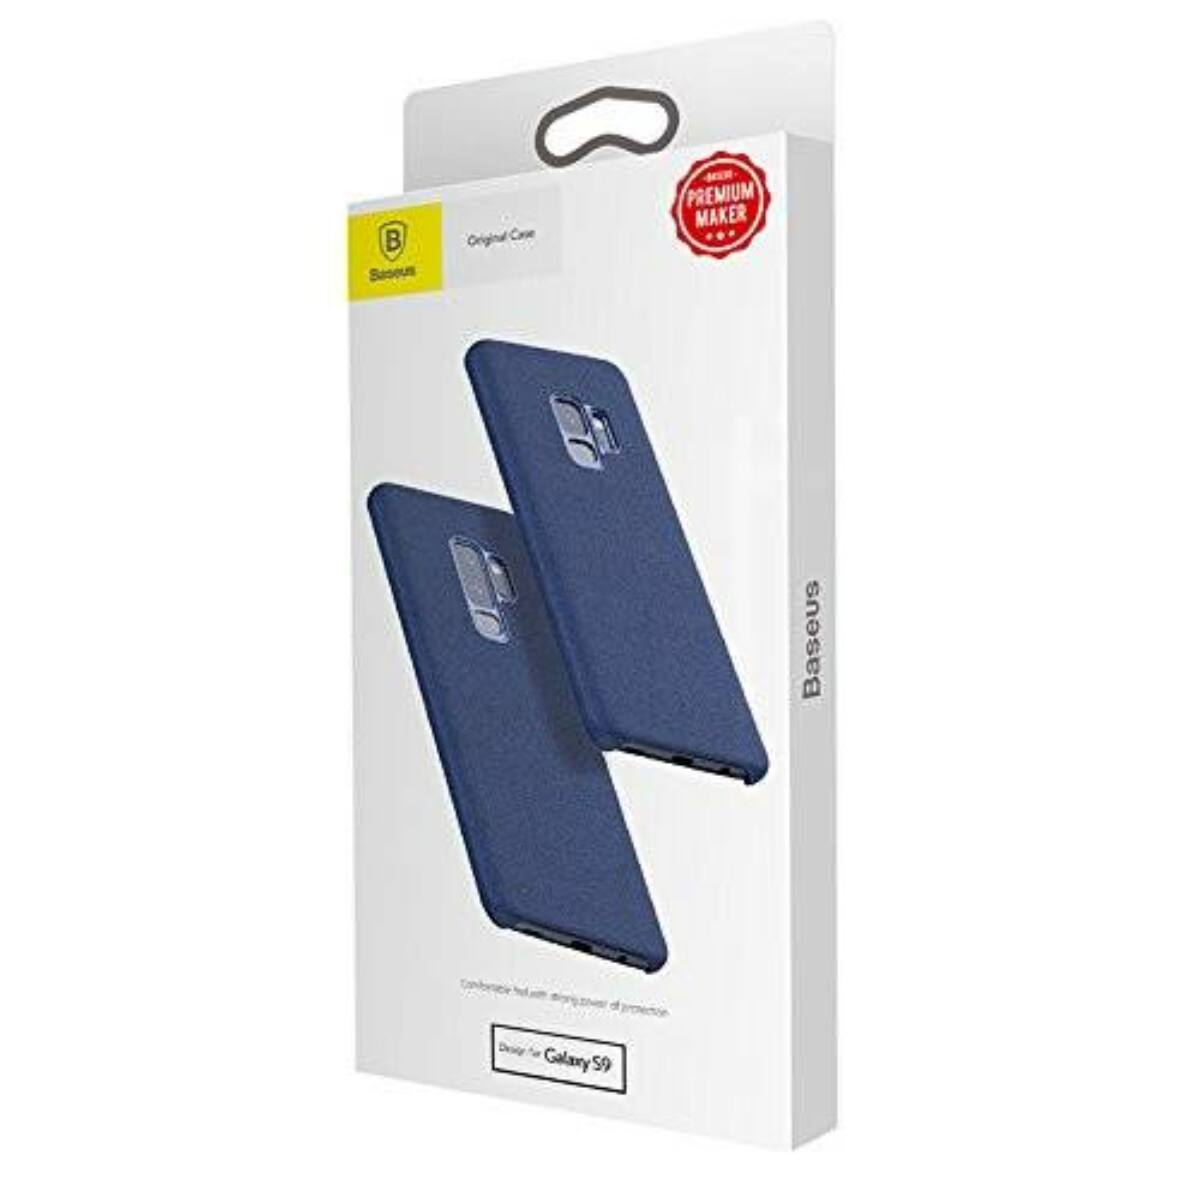 Baseus Samsung S9 tok, Original, kék (WISAS9-YP03)